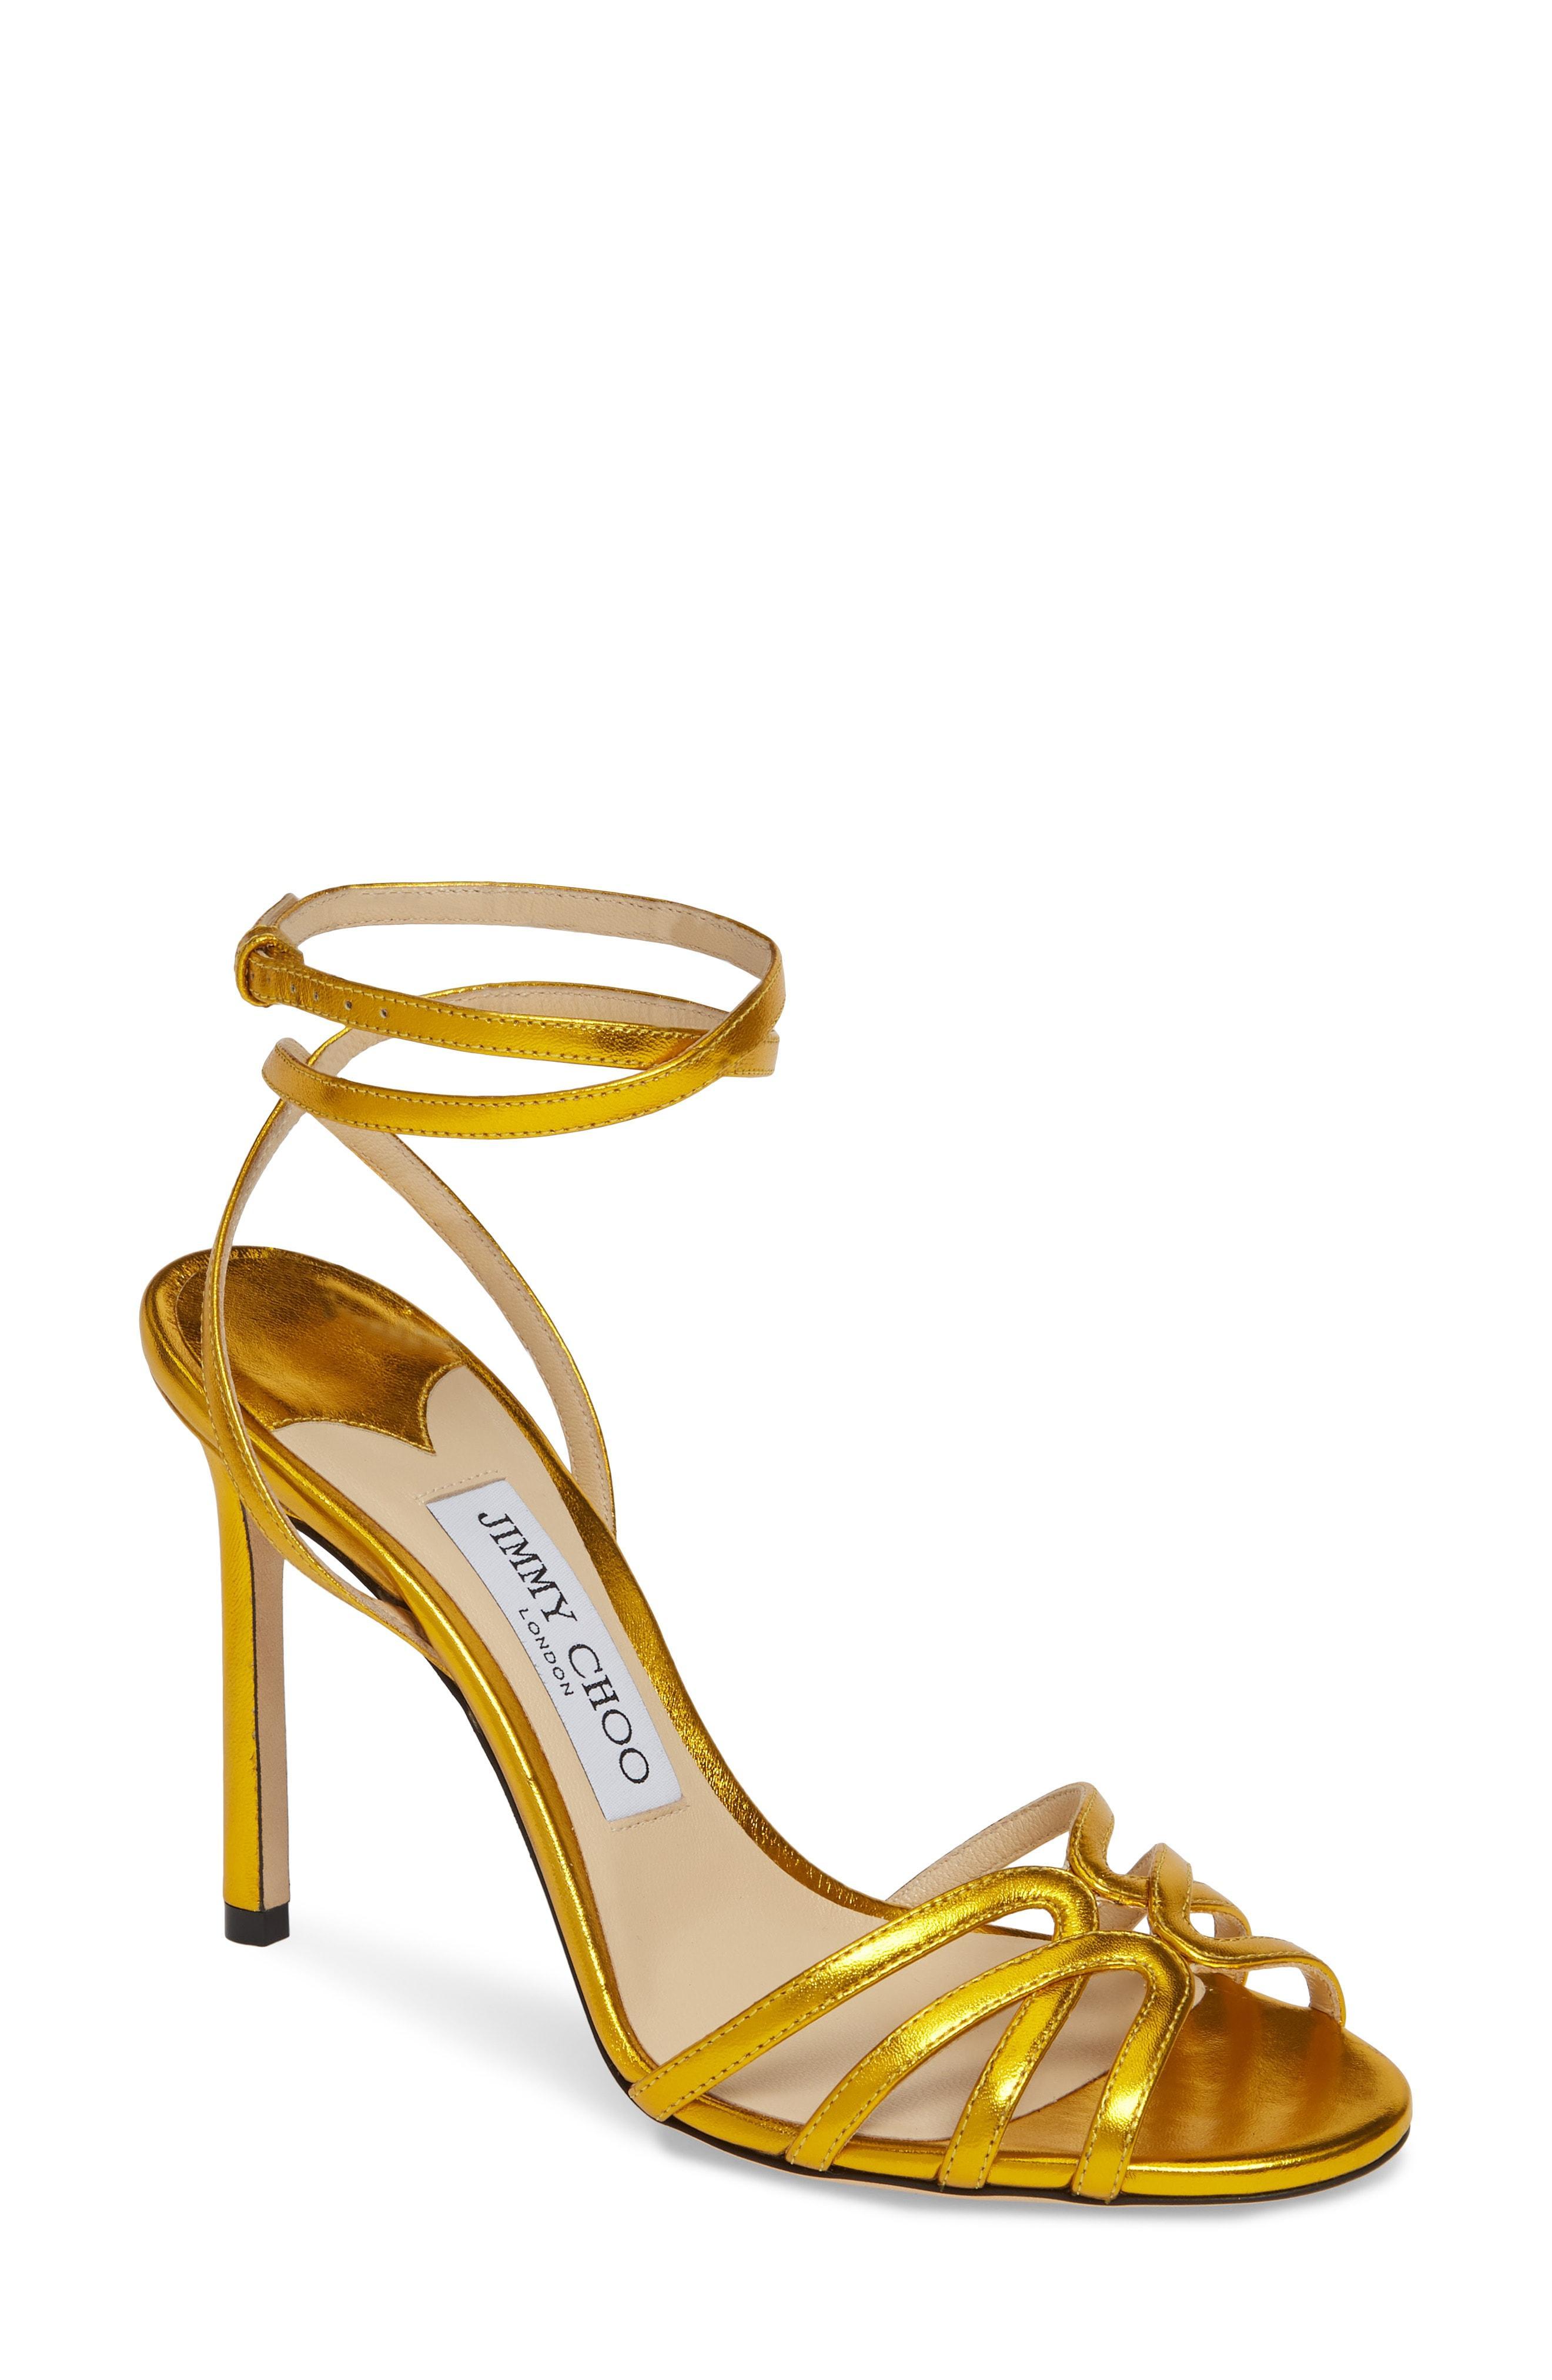 6bc89073e9e Lyst - Jimmy Choo Mimi Ankle Strap Sandal in Metallic